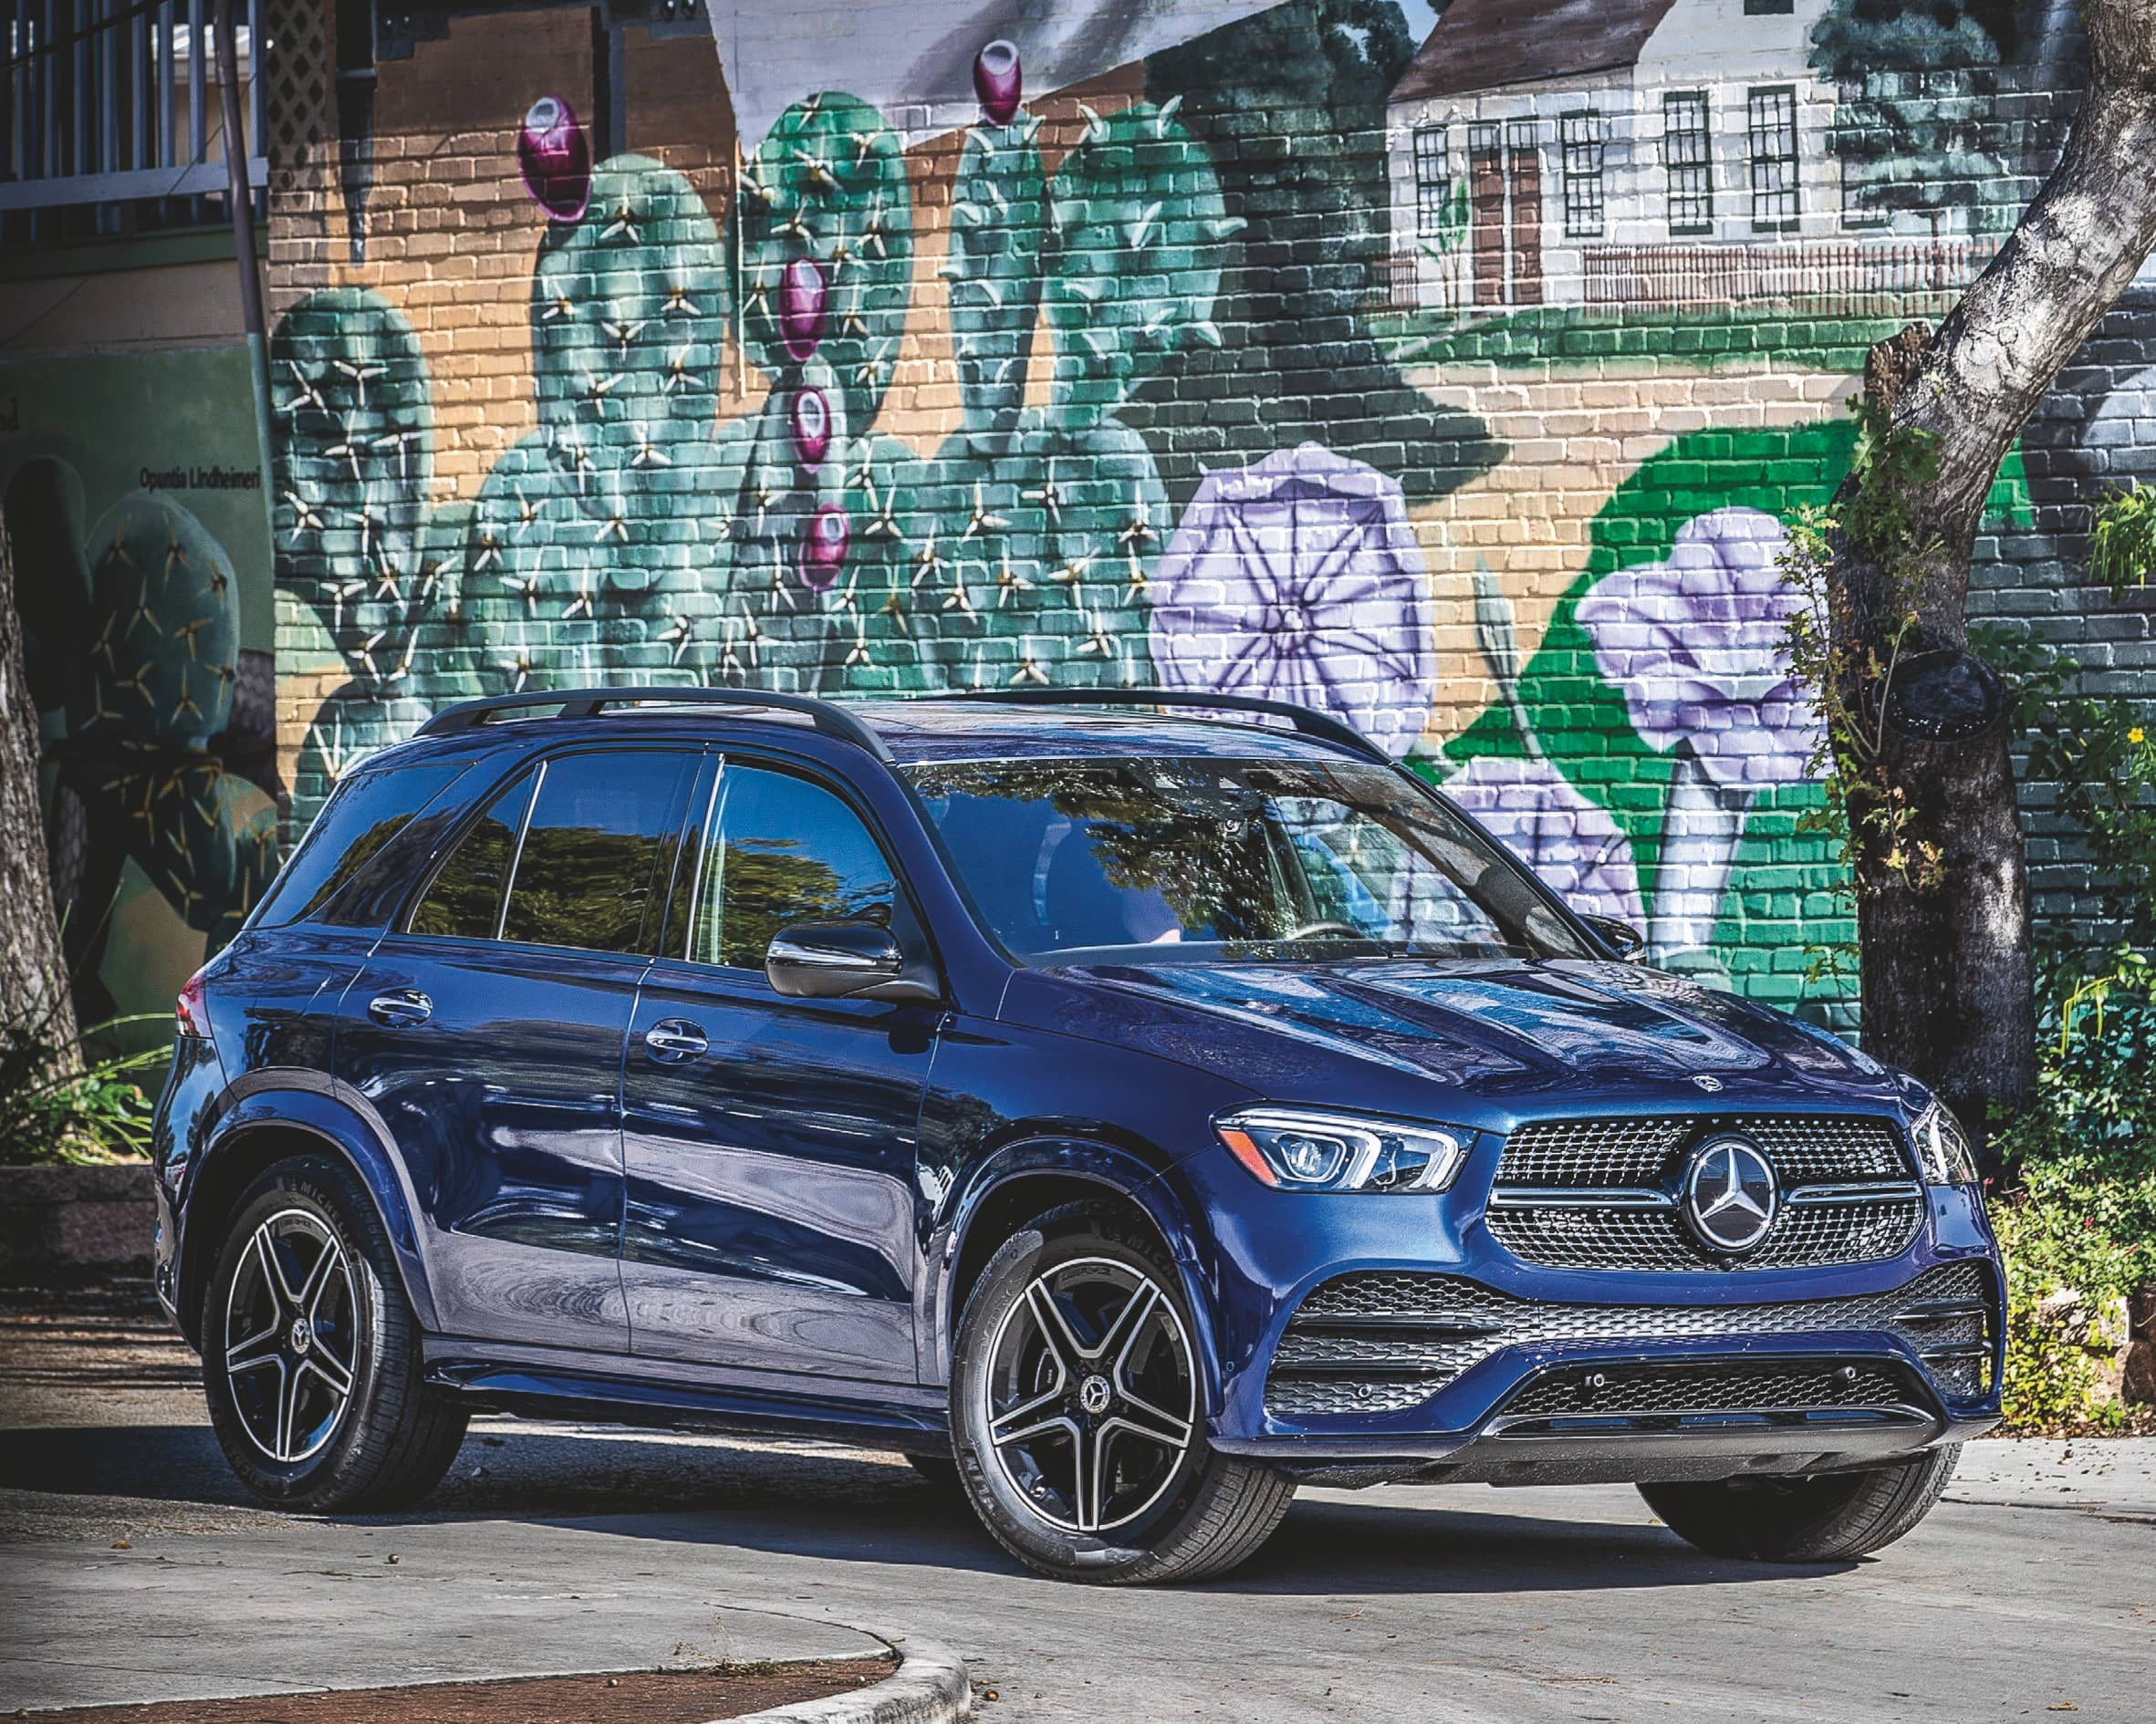 Mercedes-Benz GLE - The Gold Standard